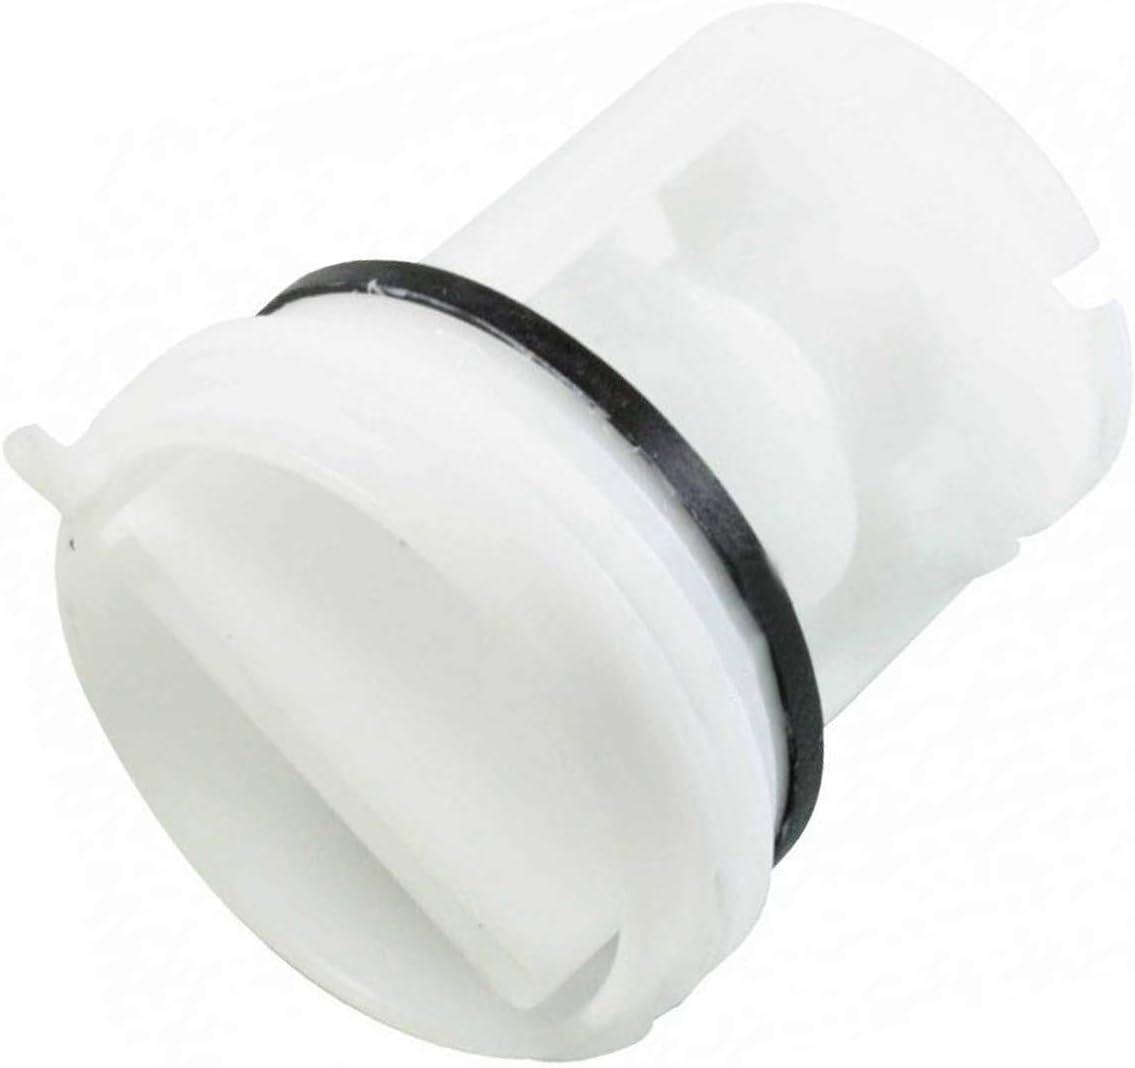 Filtro de bomba de desagüe para lavadora 42065390 Technical ...